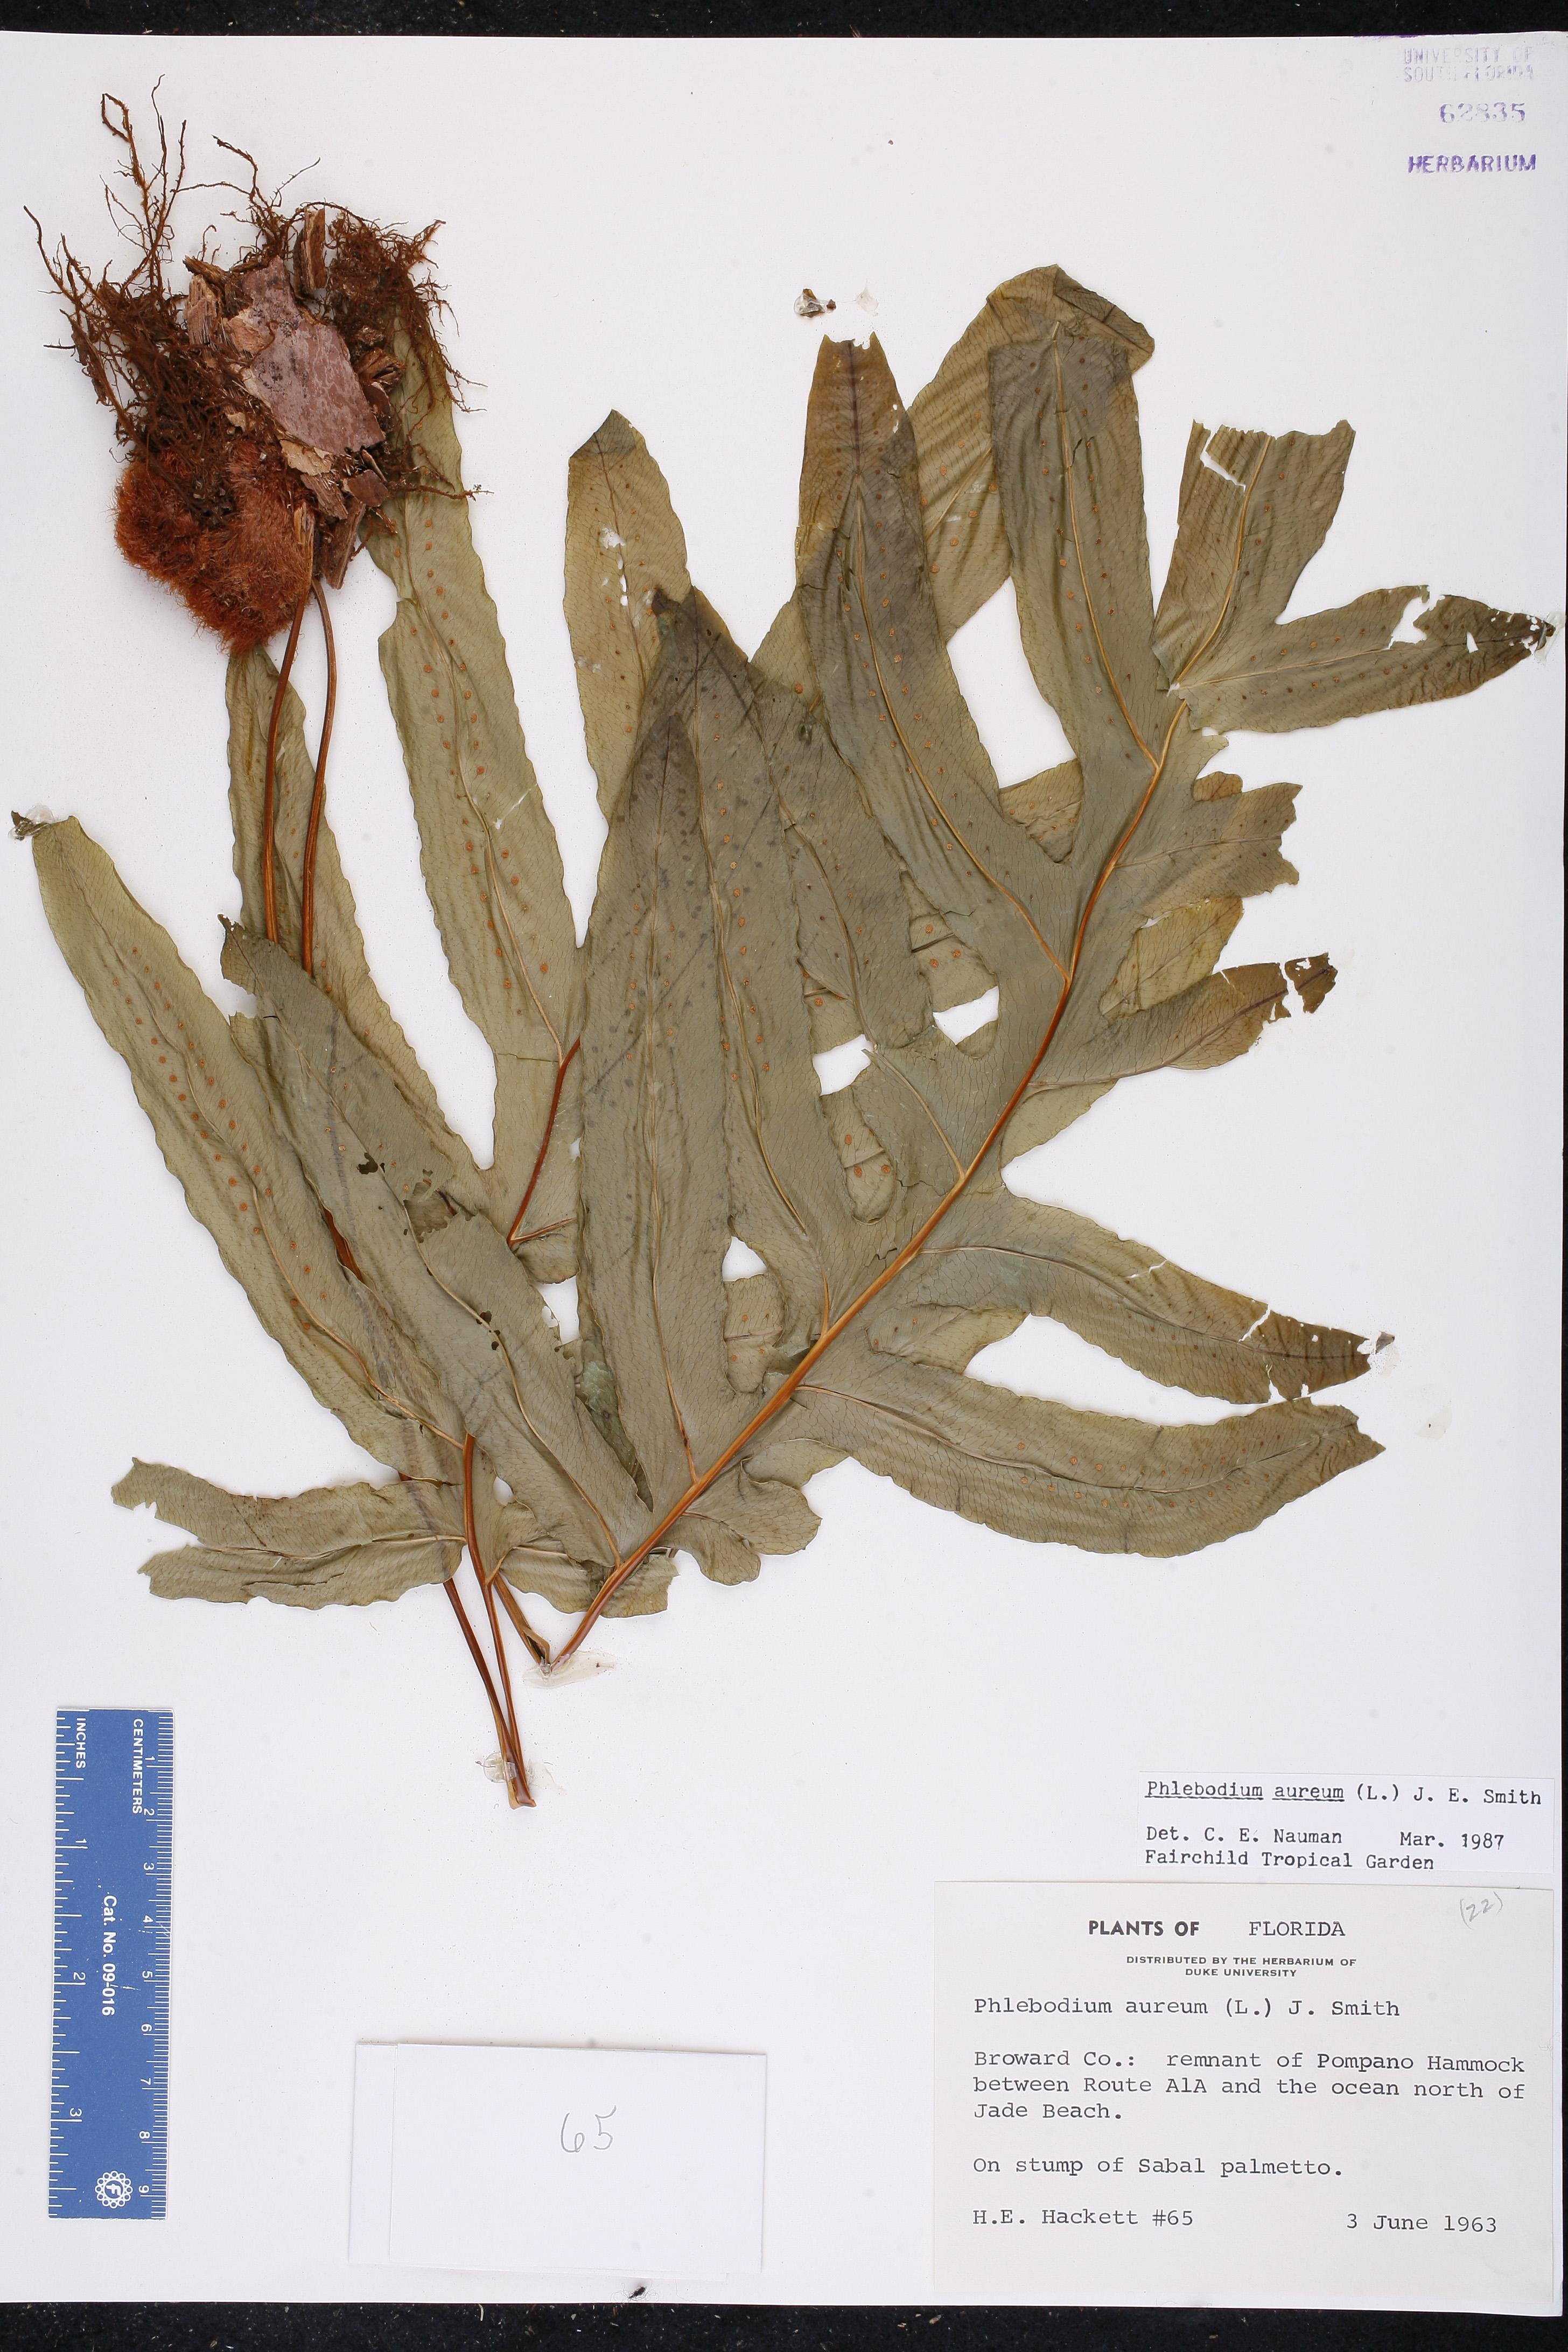 Phlebodium aureum - Species Page - ISB: Atlas of Florida Plants